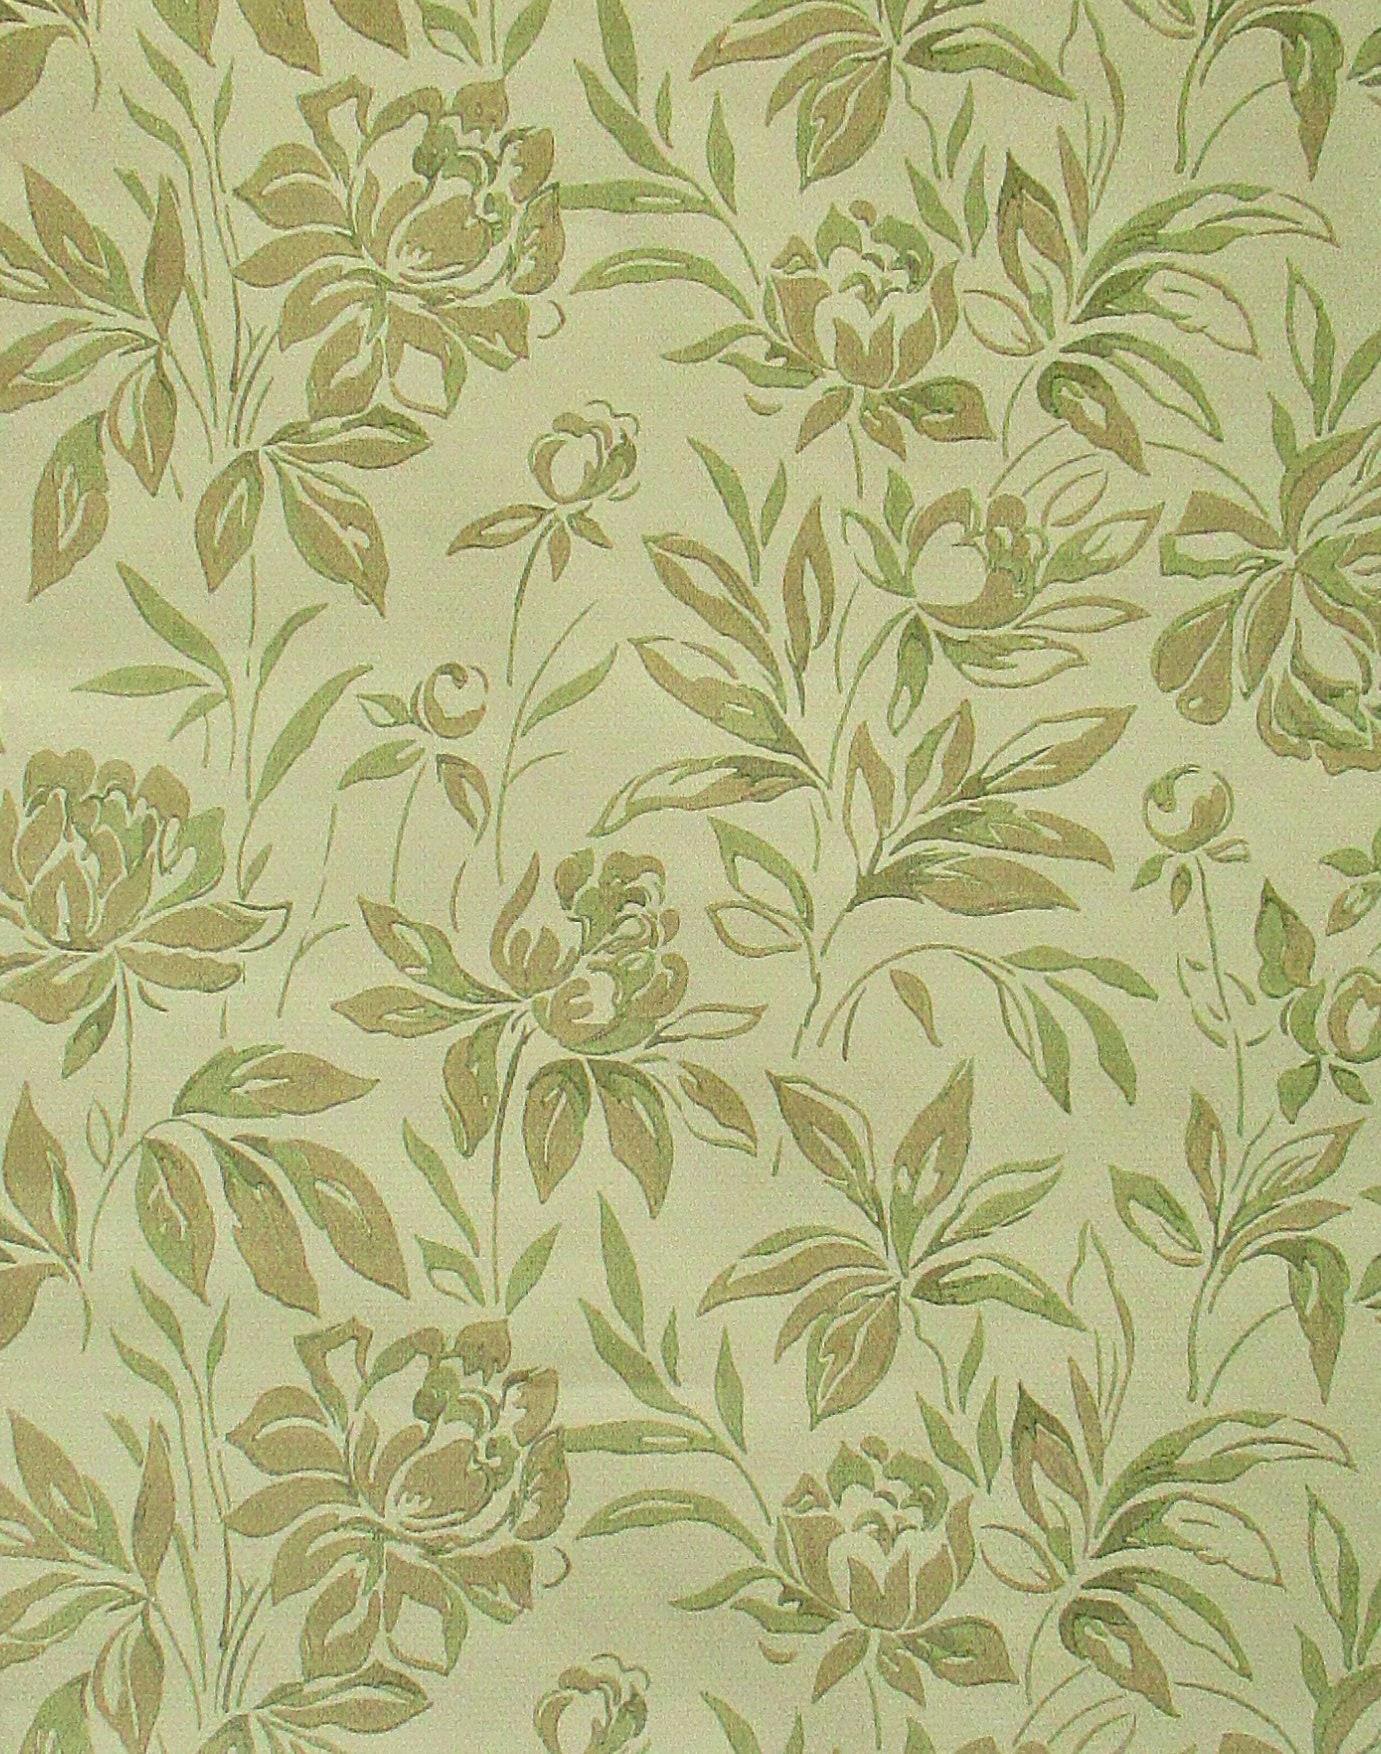 Roll Wallpaper Vintage Wallpaper Roses Botanical Pattern Etsy